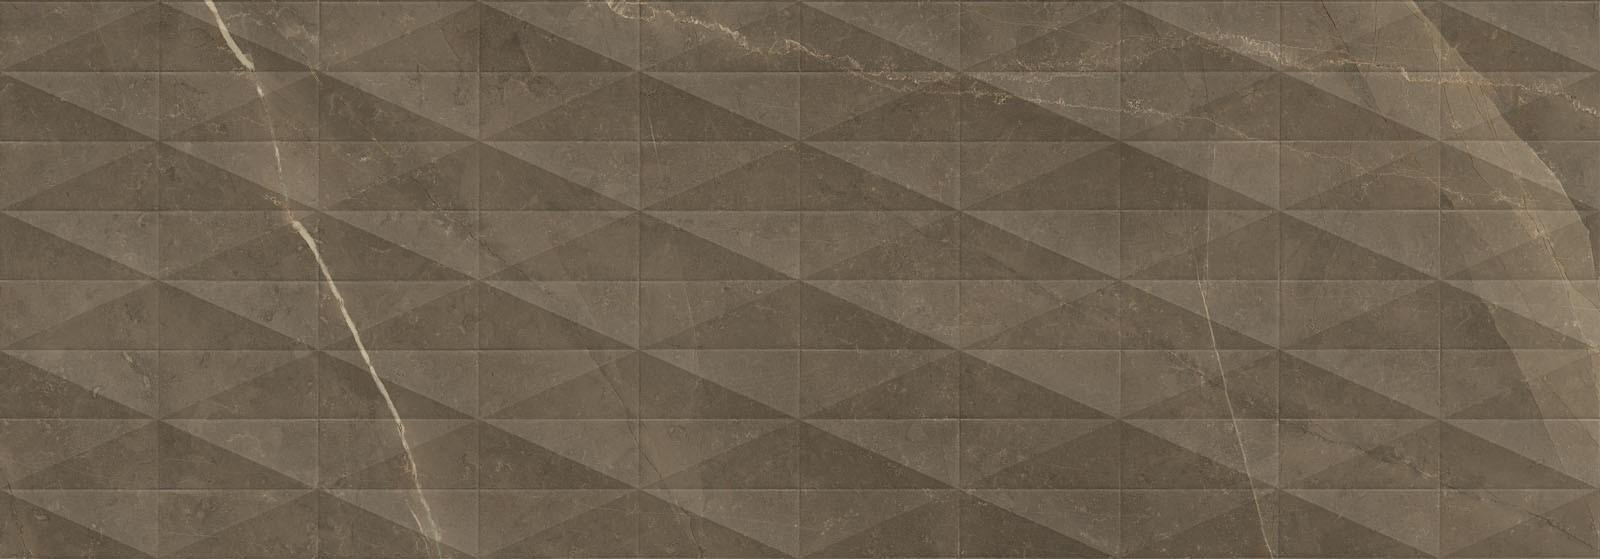 Стенни плочки Allmarble Wall Pulpis Struttura Pave 3D Satin 40x120